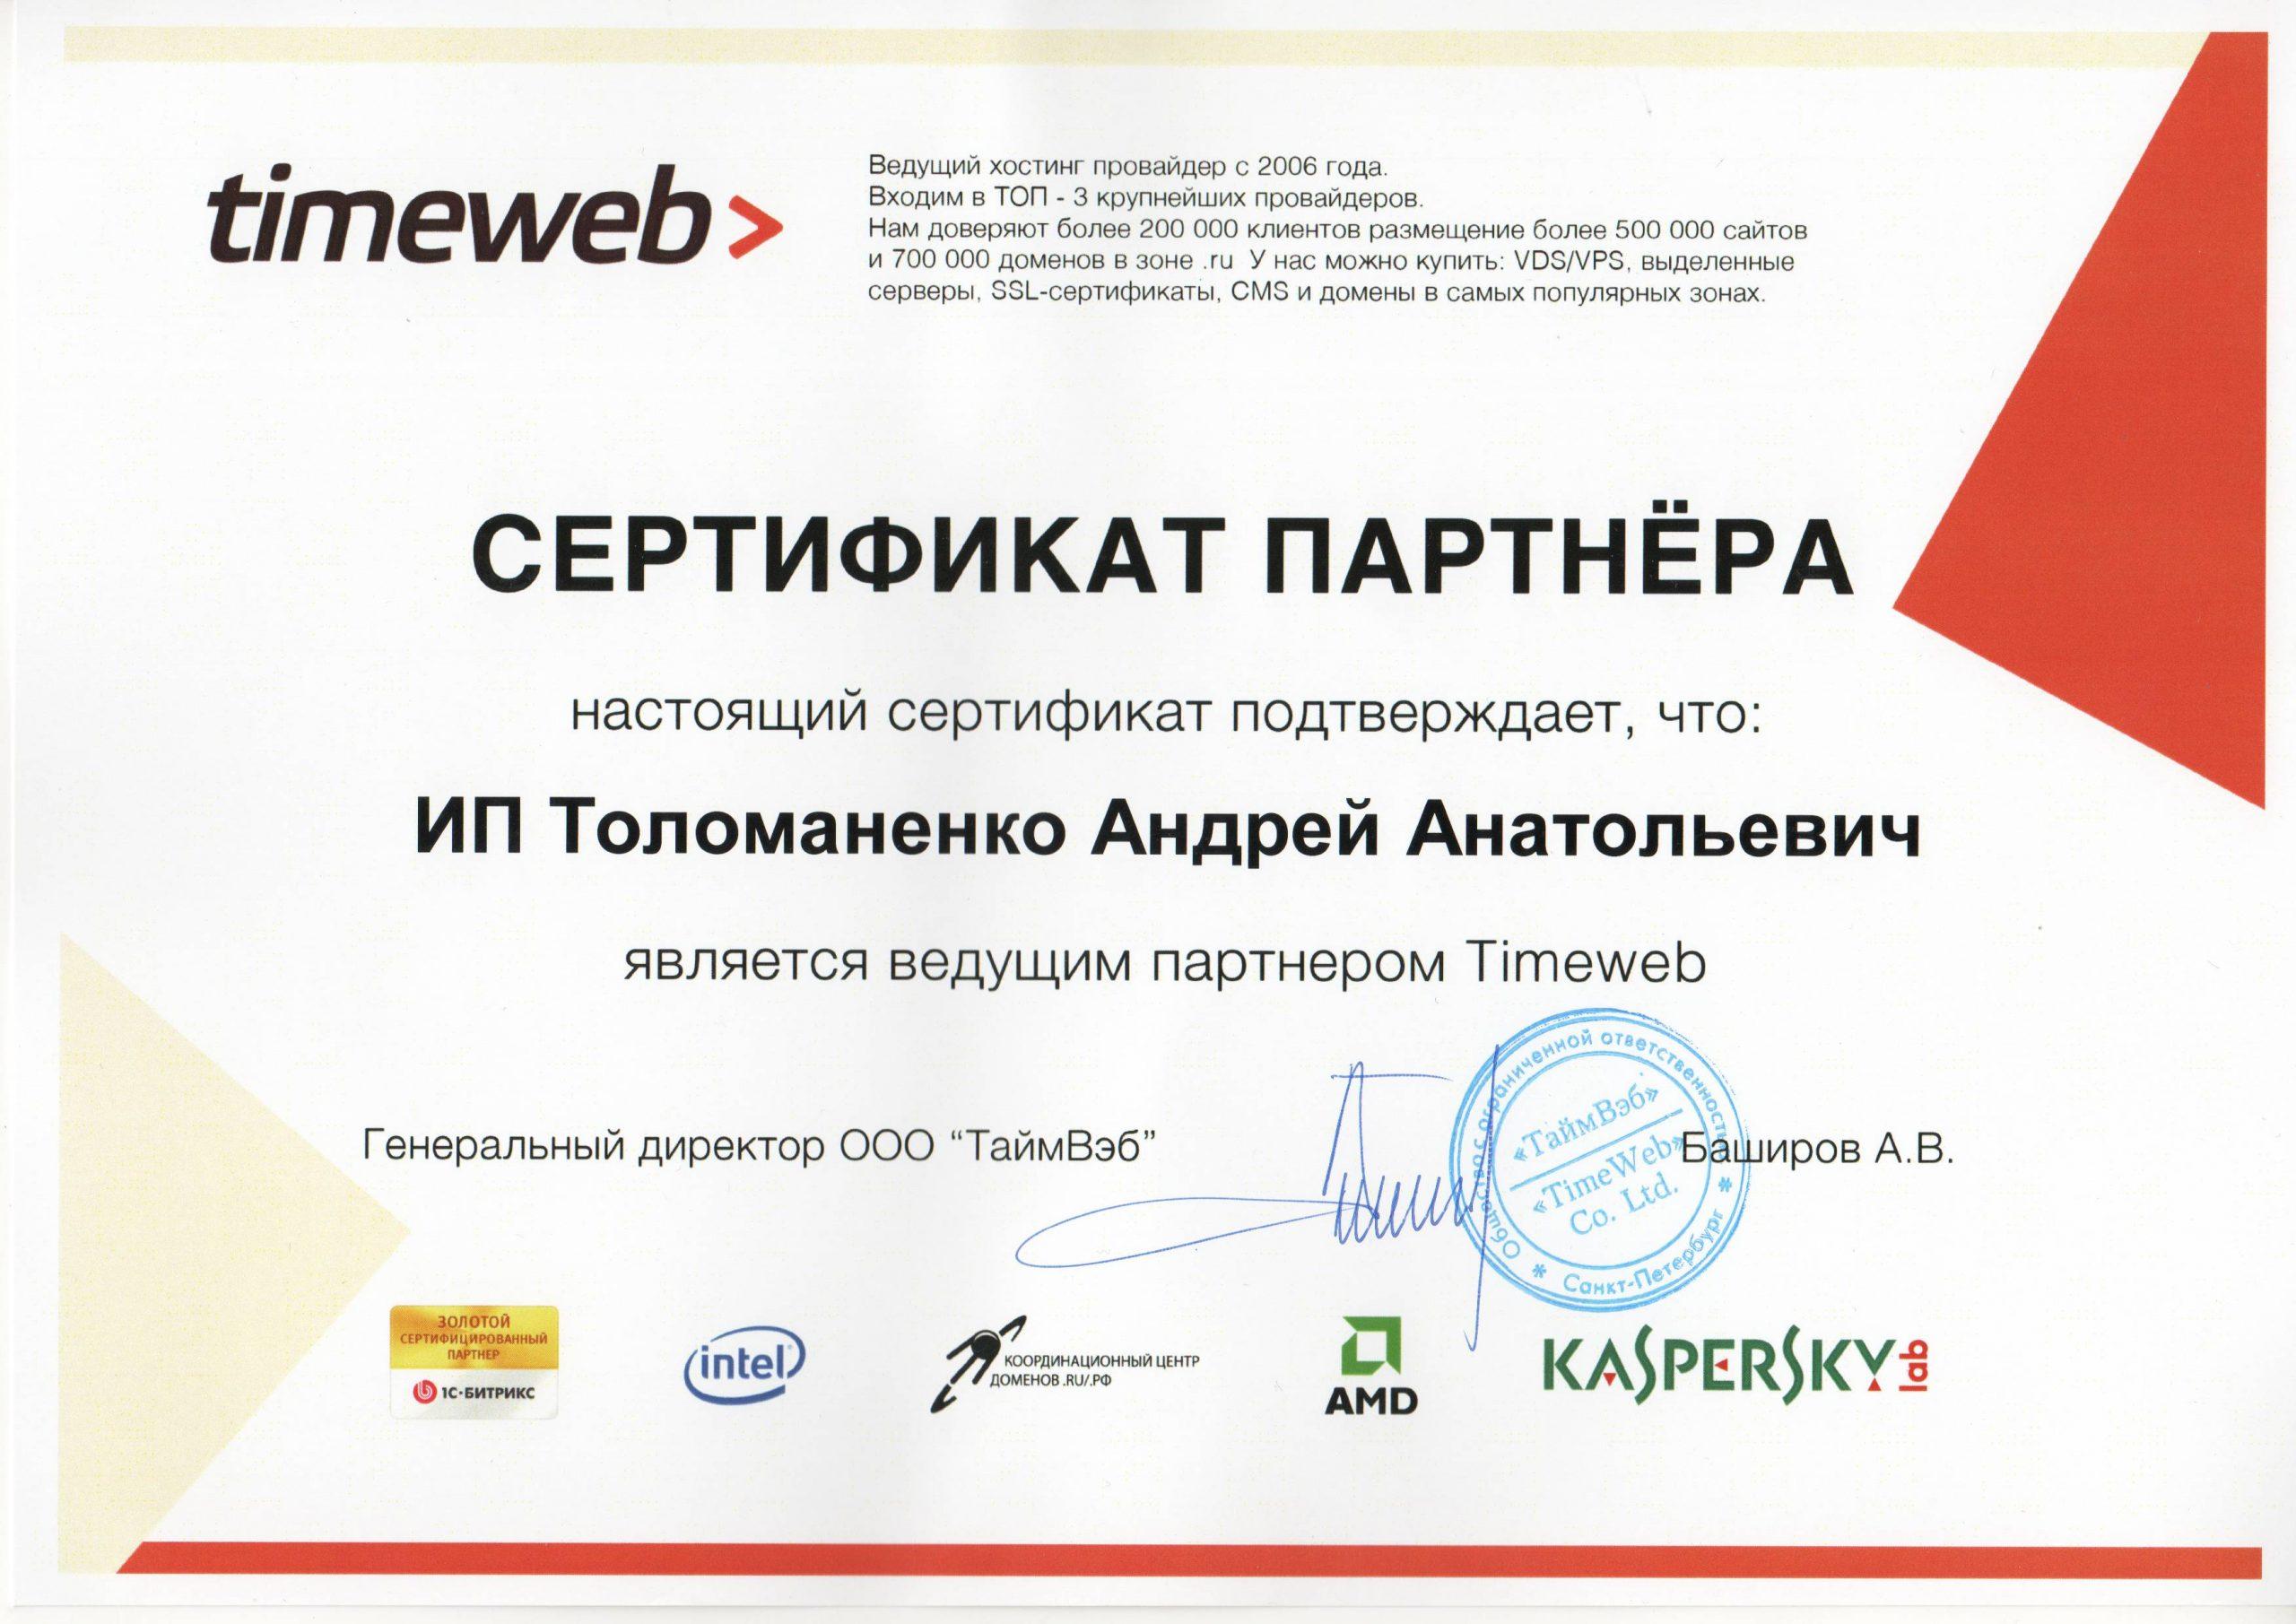 timeweb partnership scaled - Главная